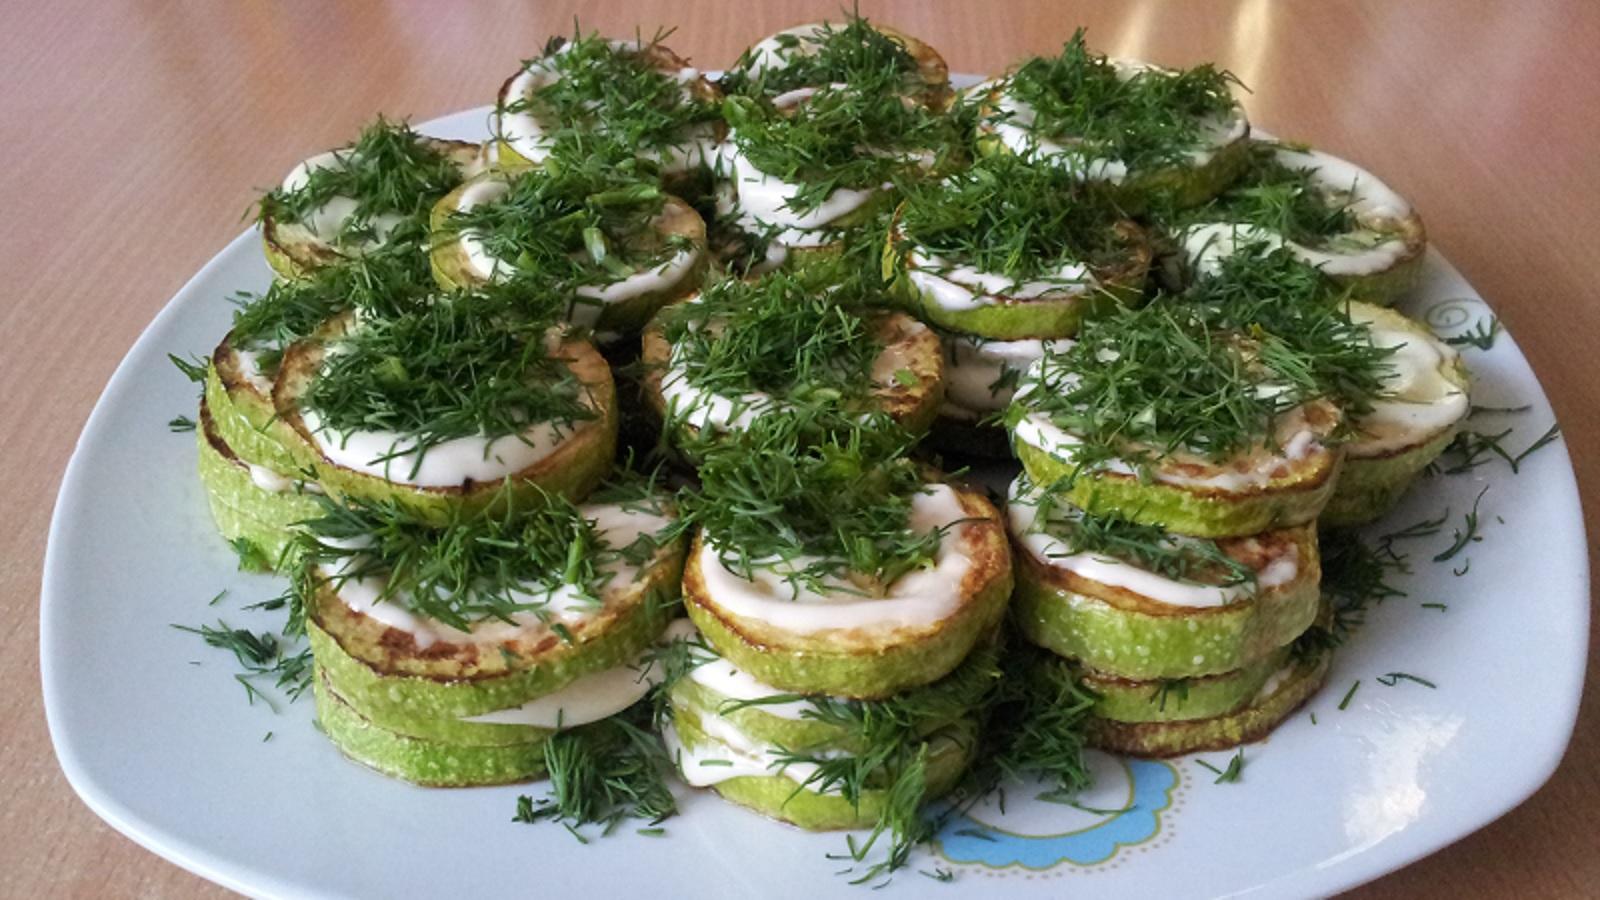 Жареные кабачки с чесноком и помидорами майонезом рецепт пошагово